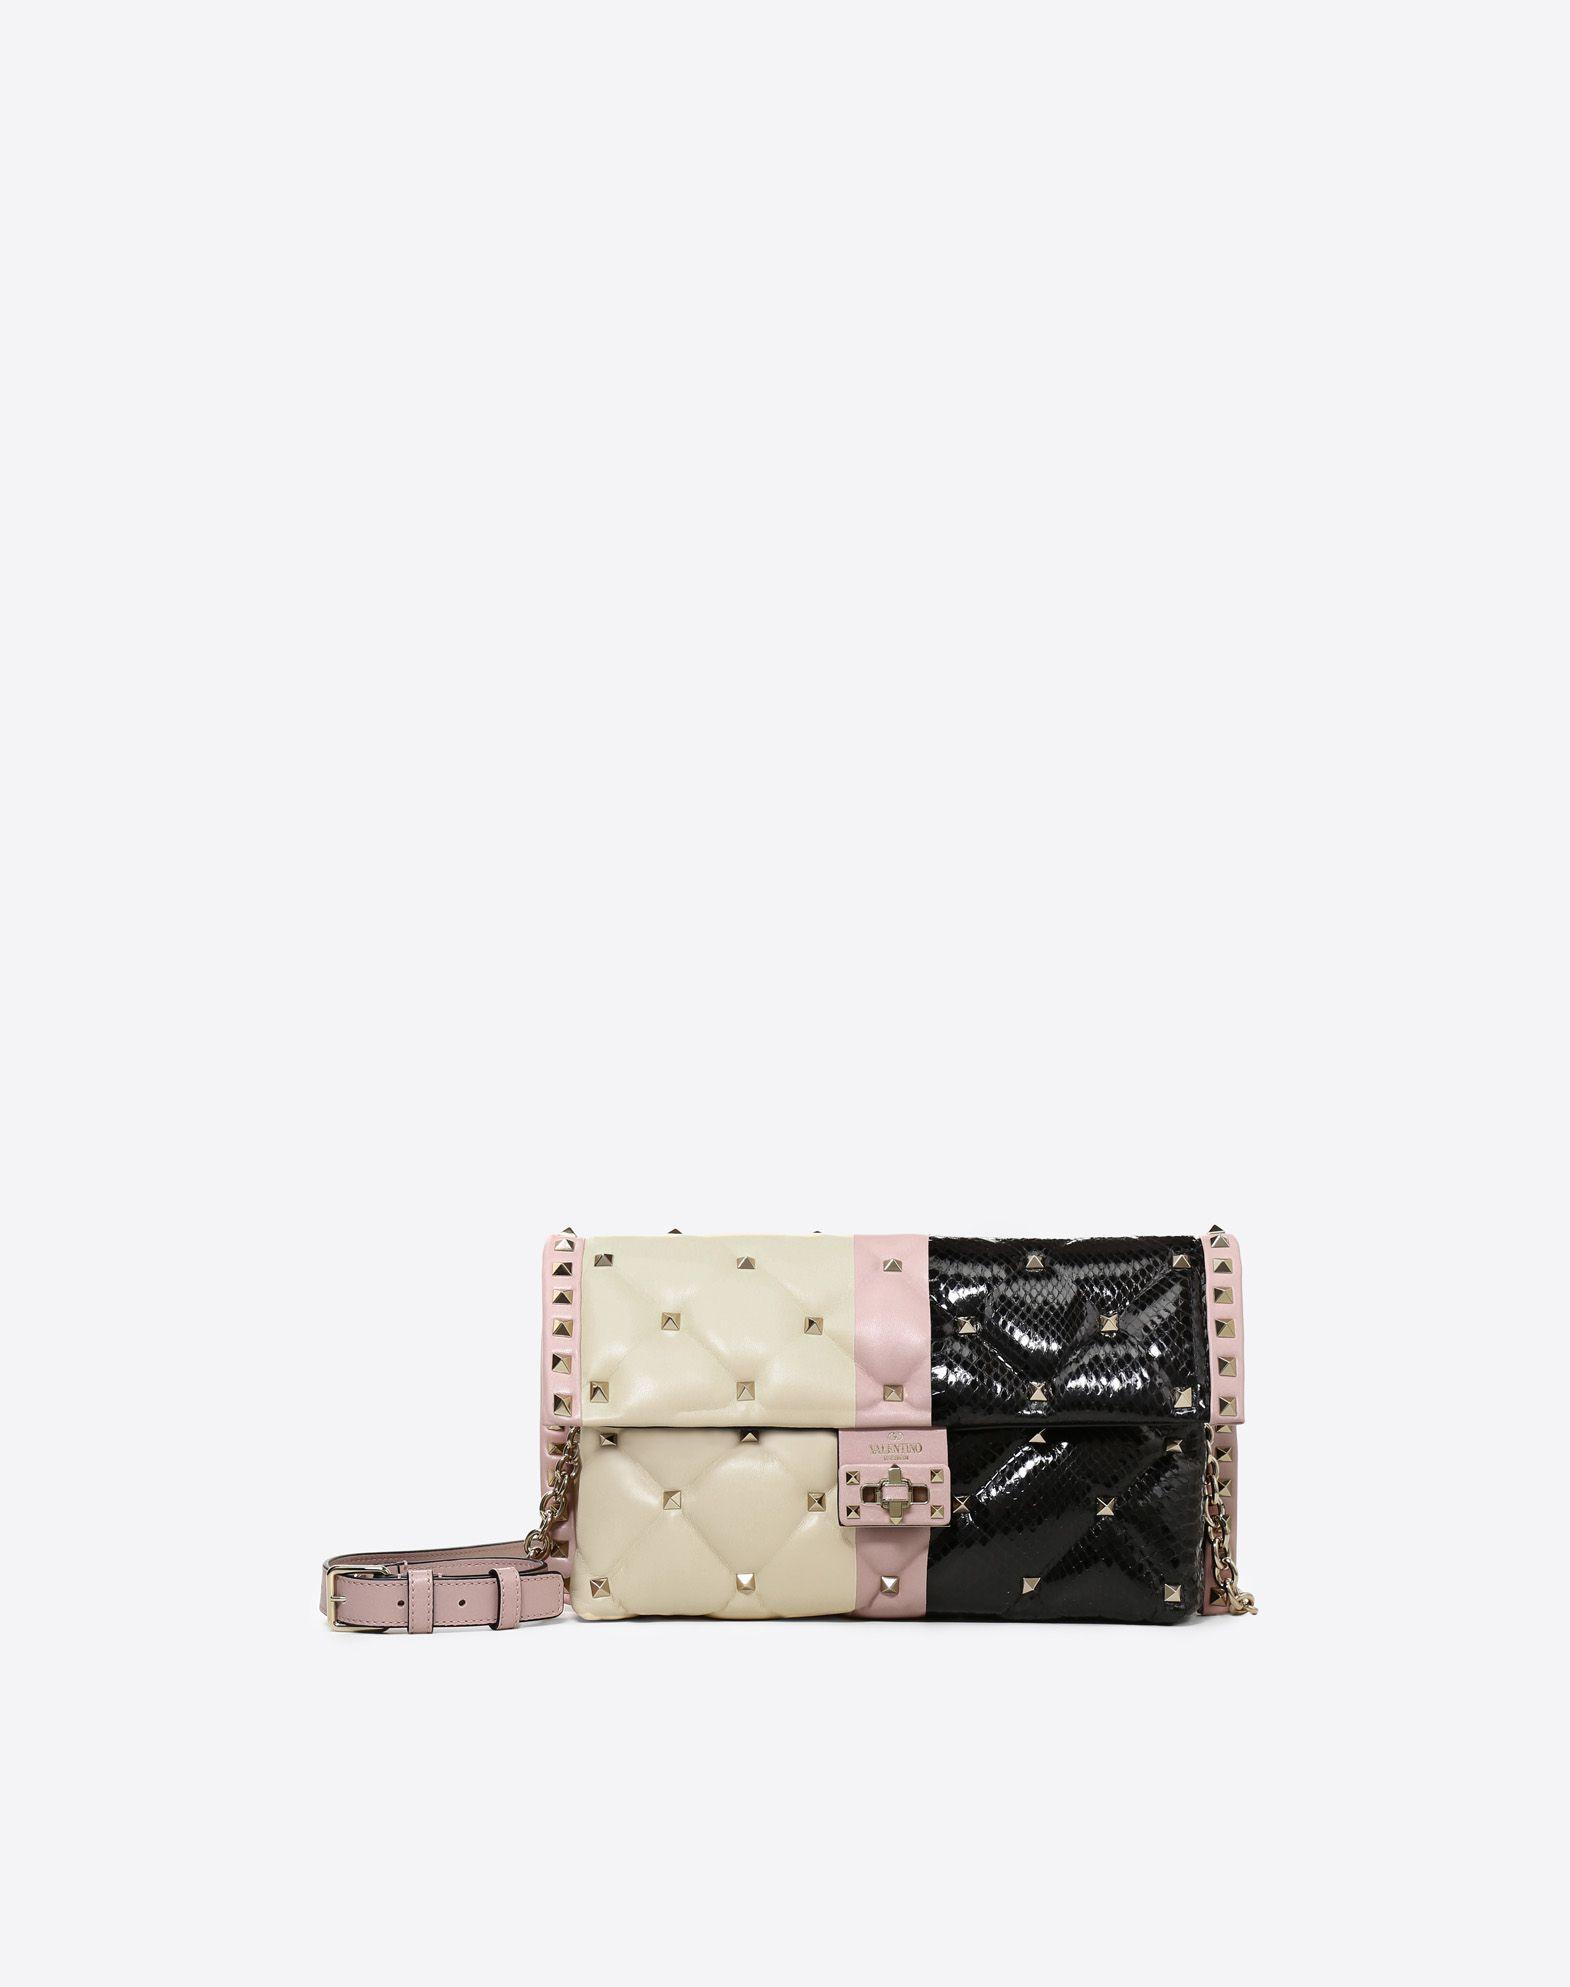 VALENTINO GARAVANI Candystud Cross-body Bag CROSS BODY BAG D f